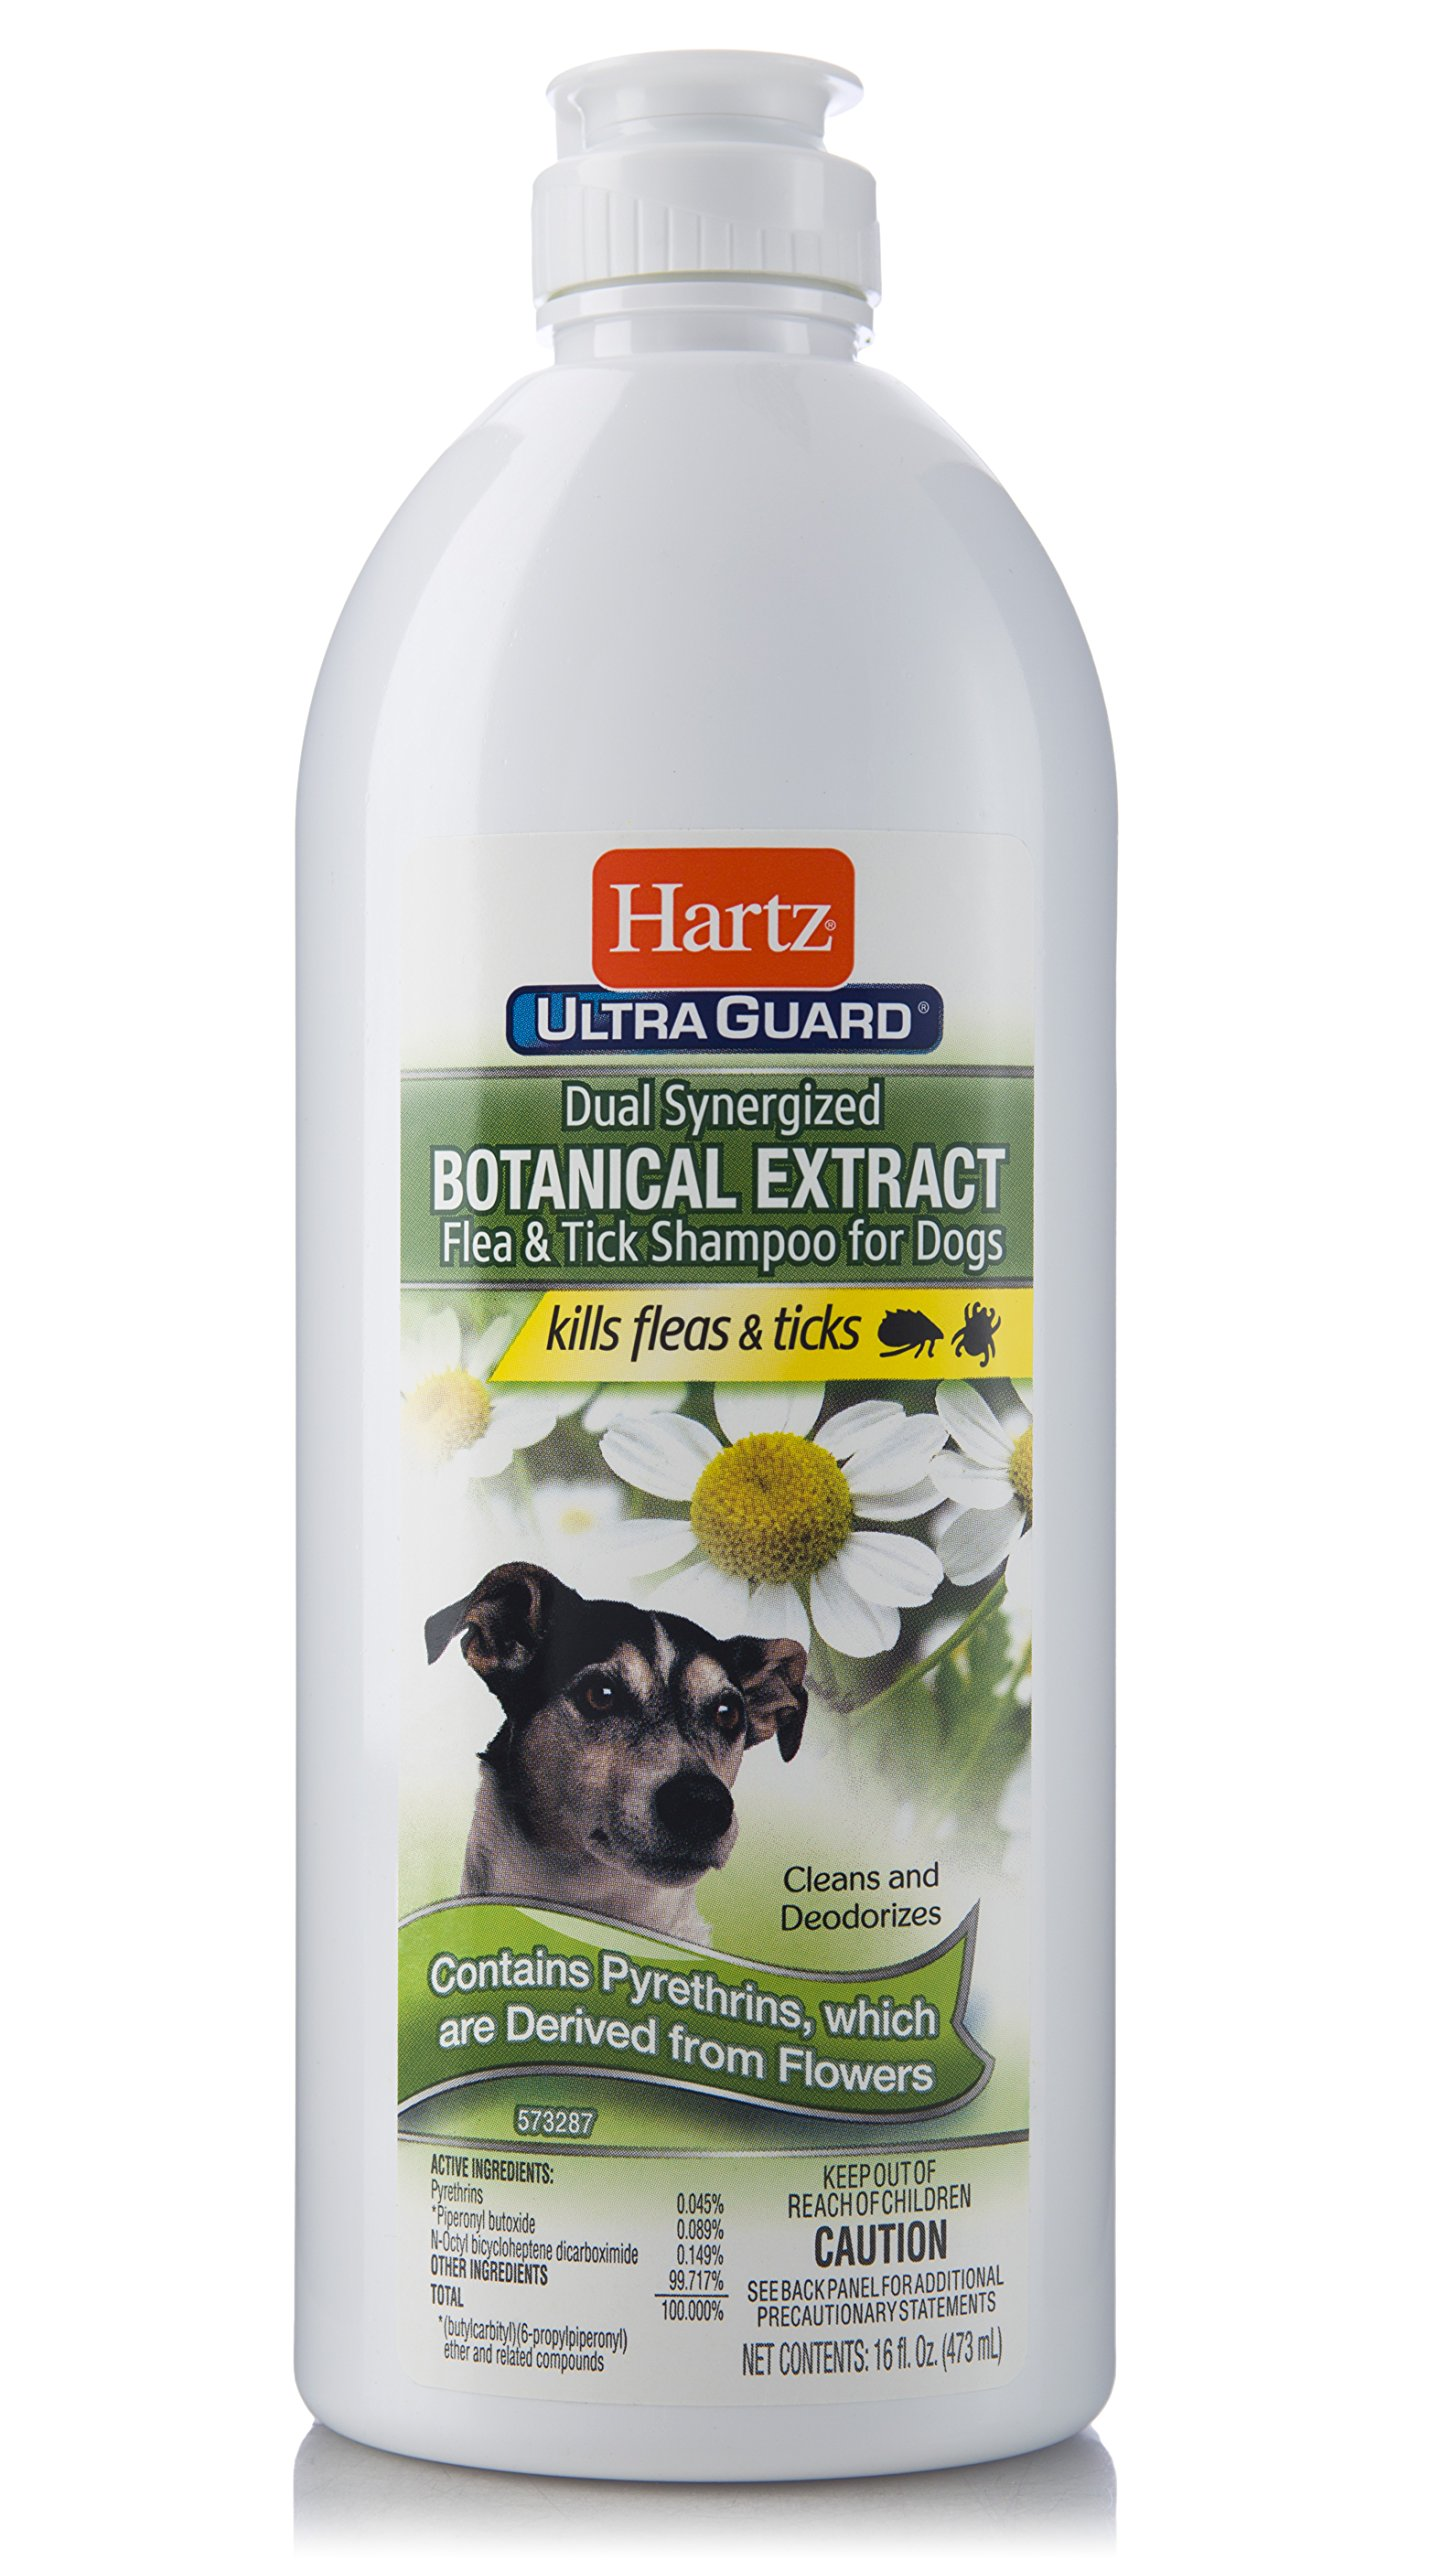 Hartz UltraGuard Botanical Extract Flea & Tick Dog Shampoo